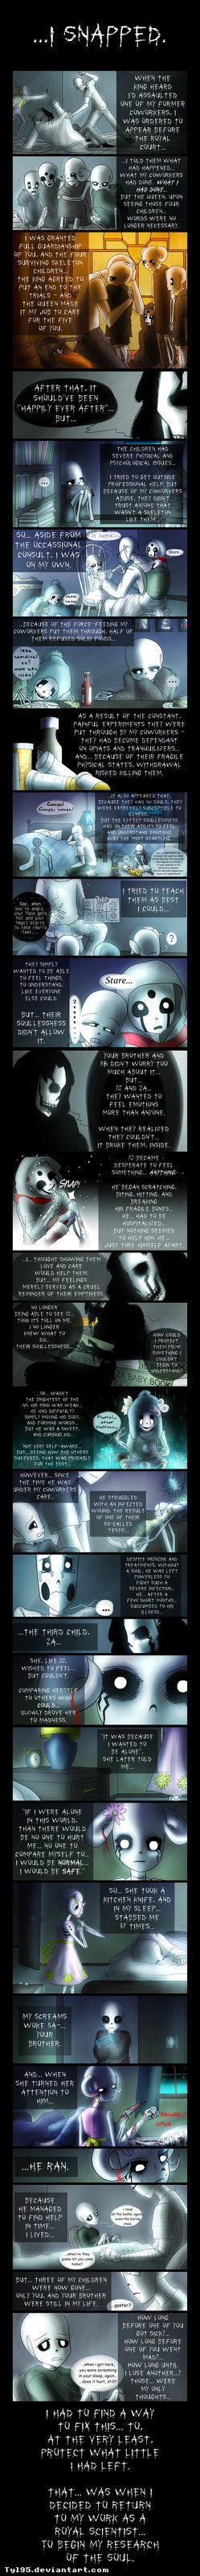 Home and Heart (Undertale Comic) by Tyl95.deviantart.com on @DeviantArt